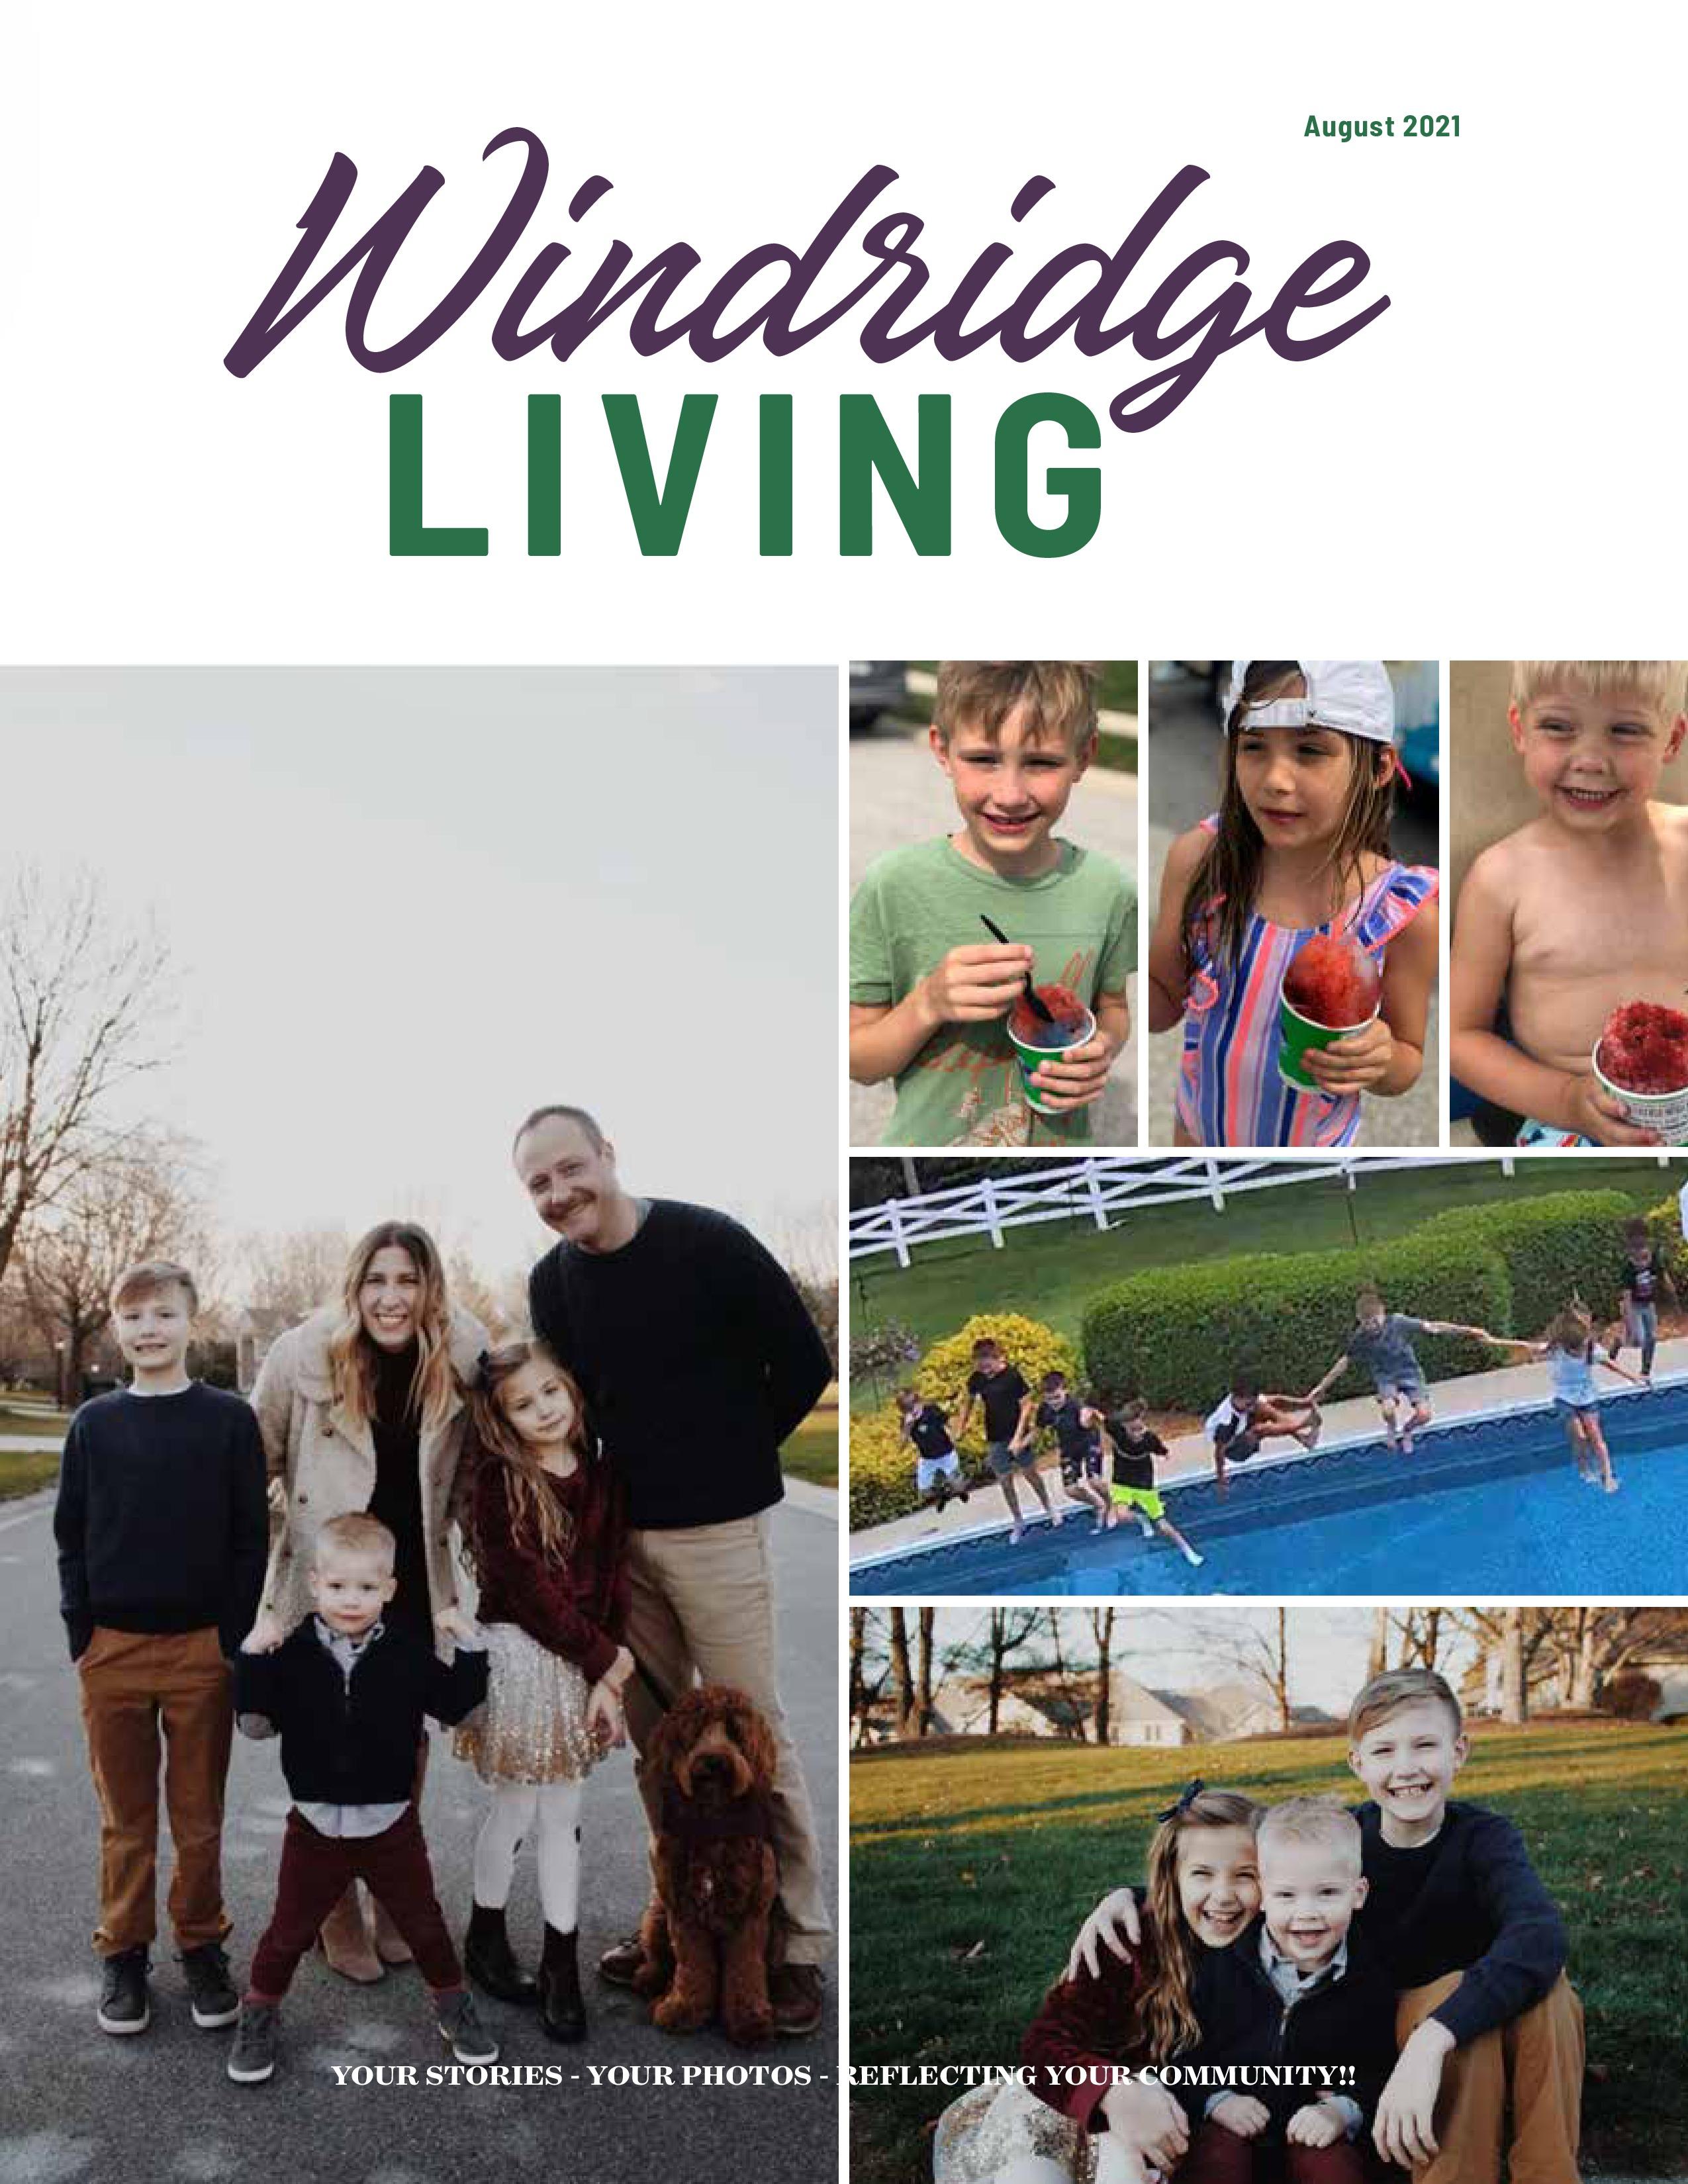 Windridge Living 2021-08-01